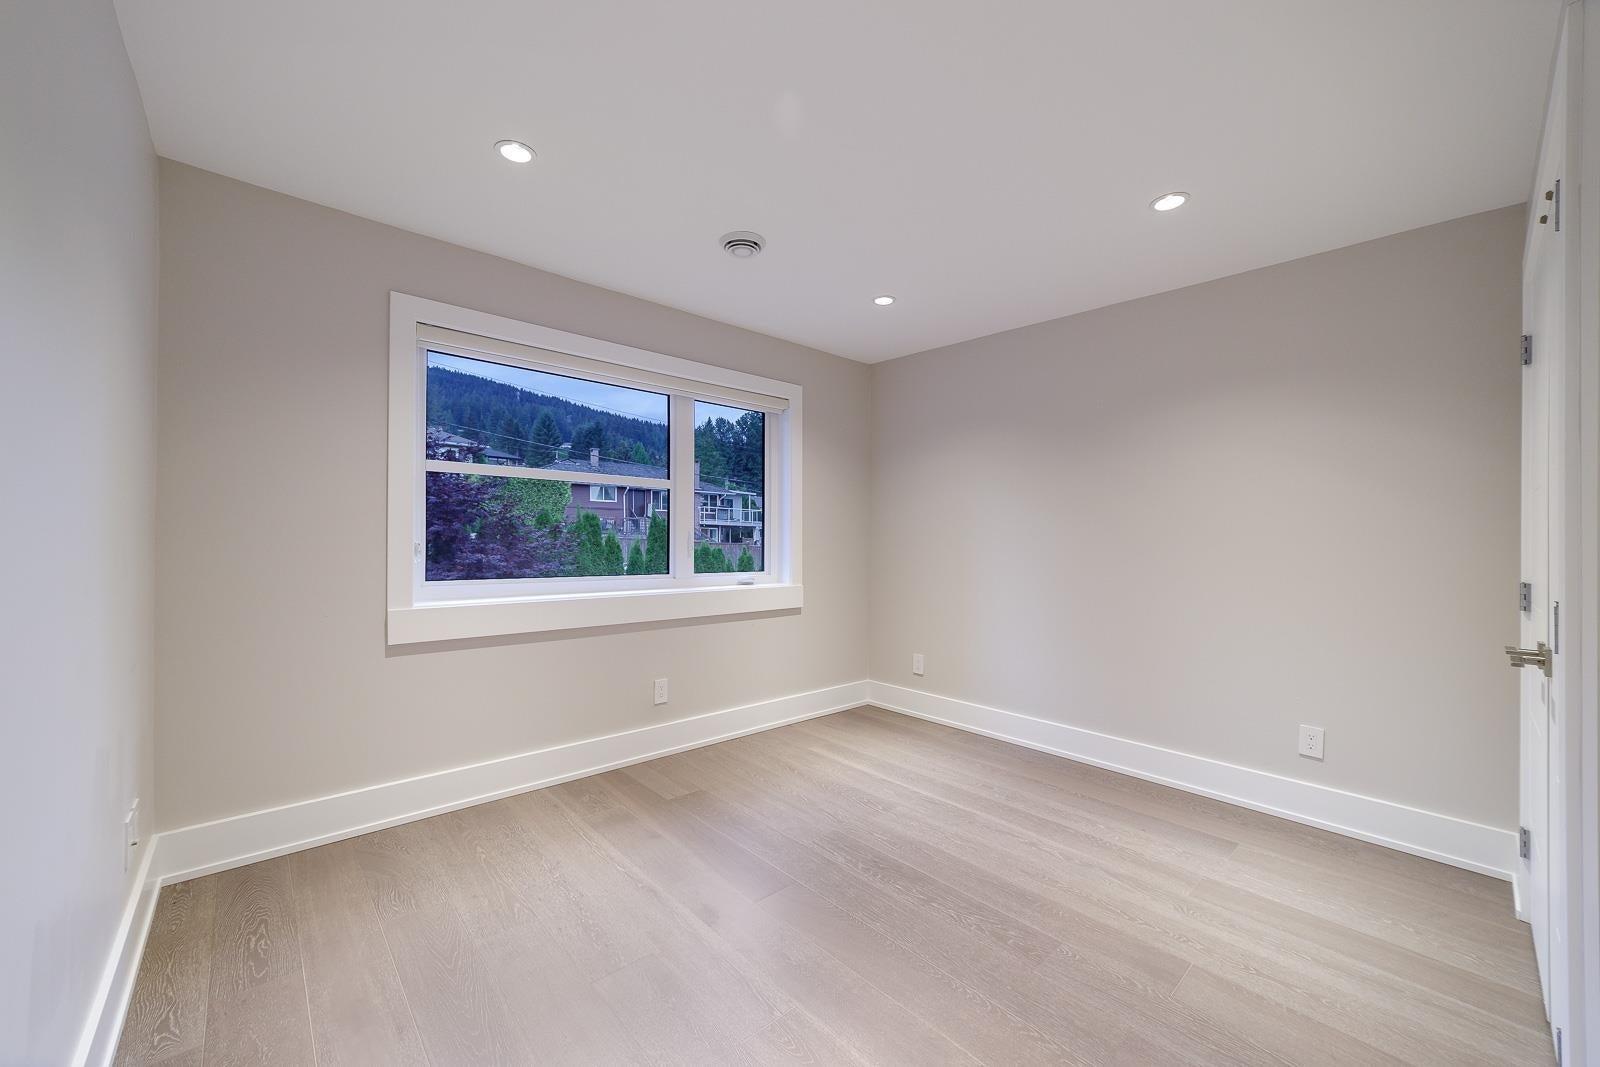 517 GRANADA CRESCENT - Upper Delbrook House/Single Family for sale, 8 Bedrooms (R2615057) - #21